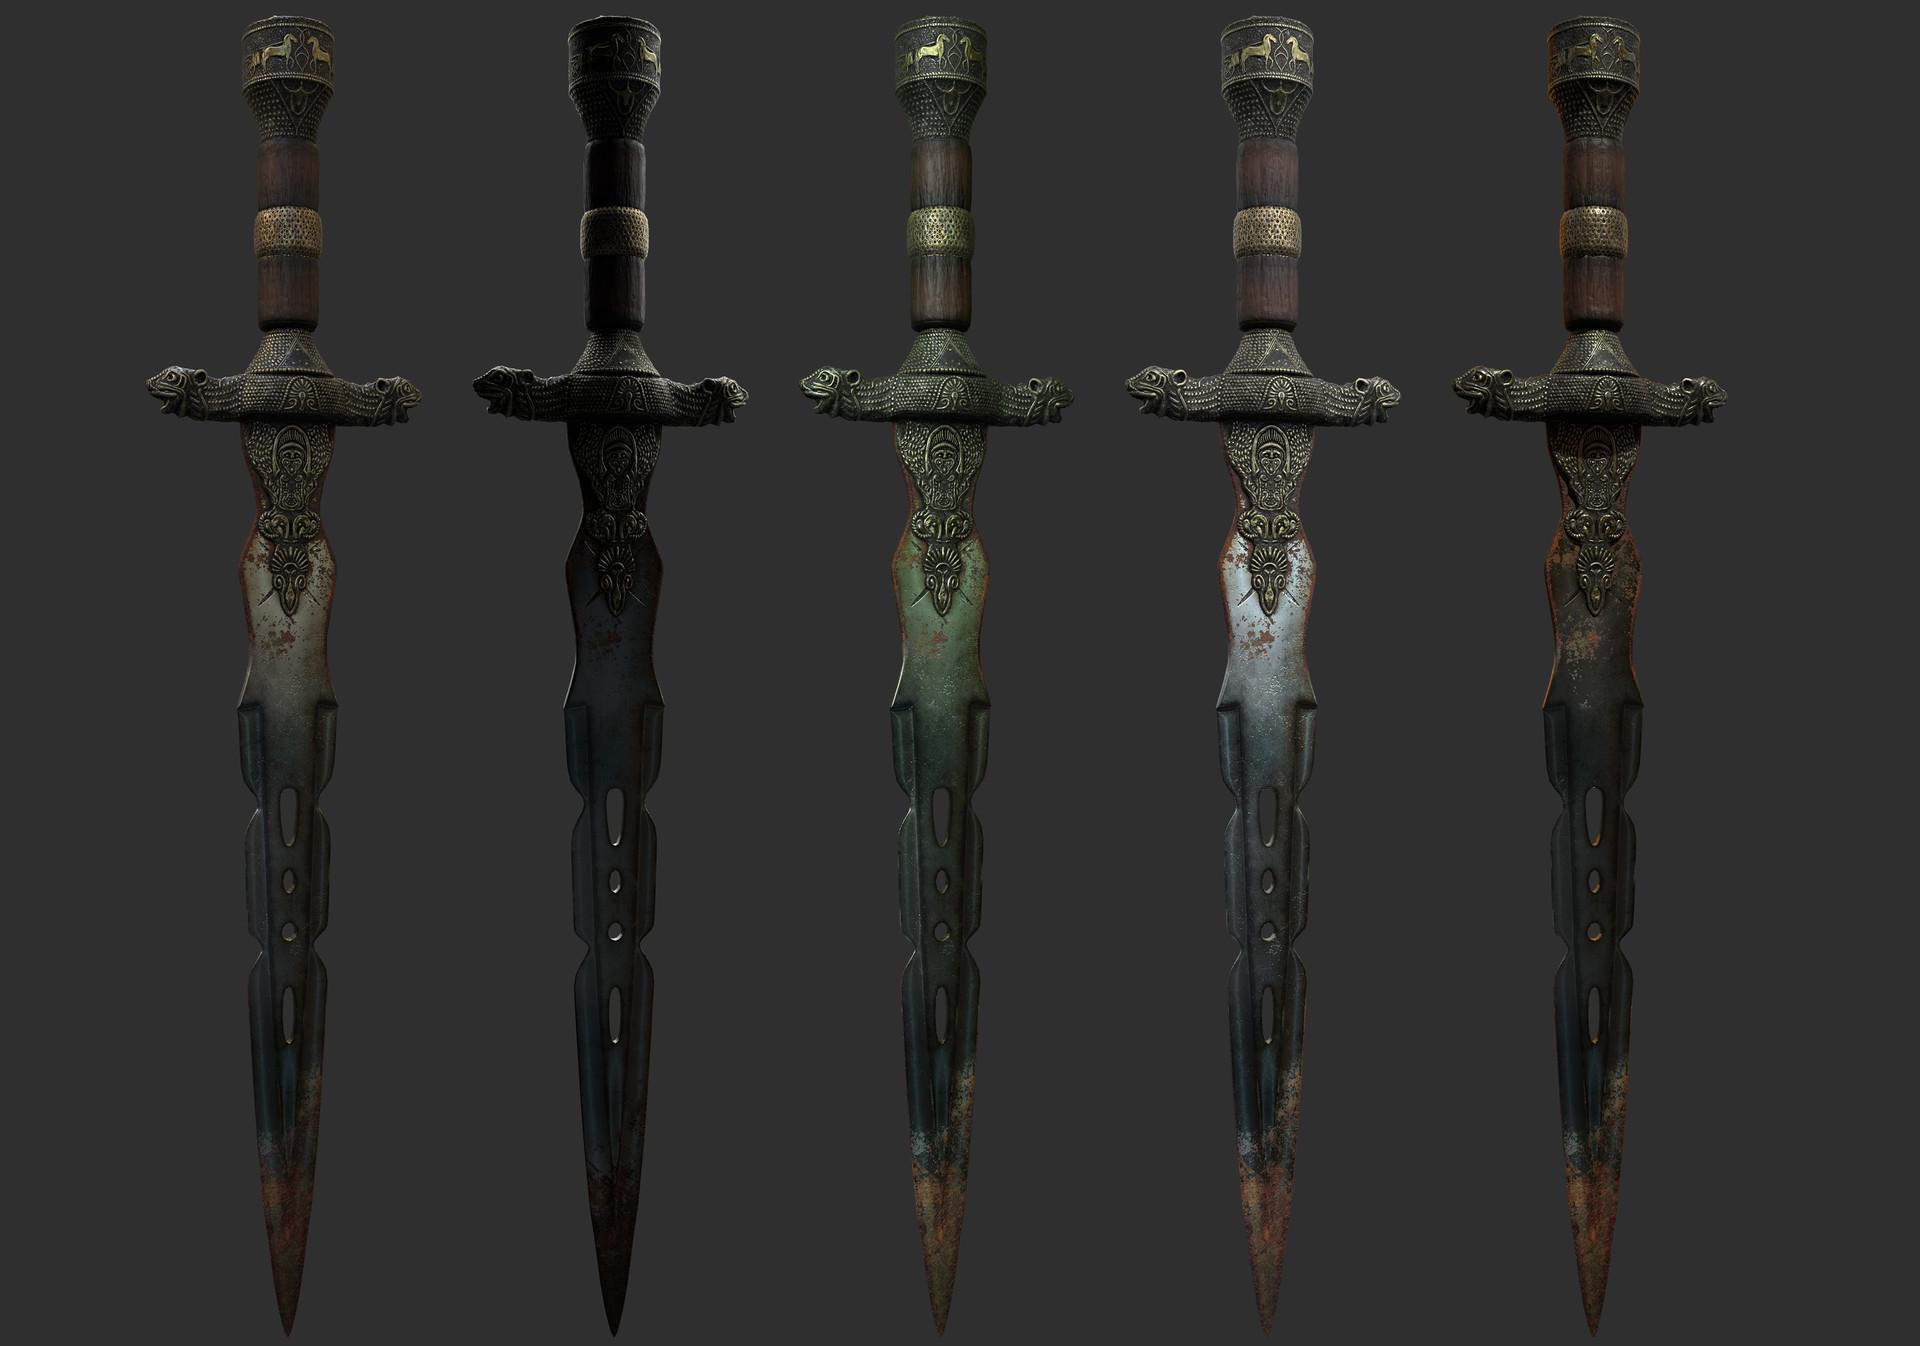 Roberto tula old dagger lighting